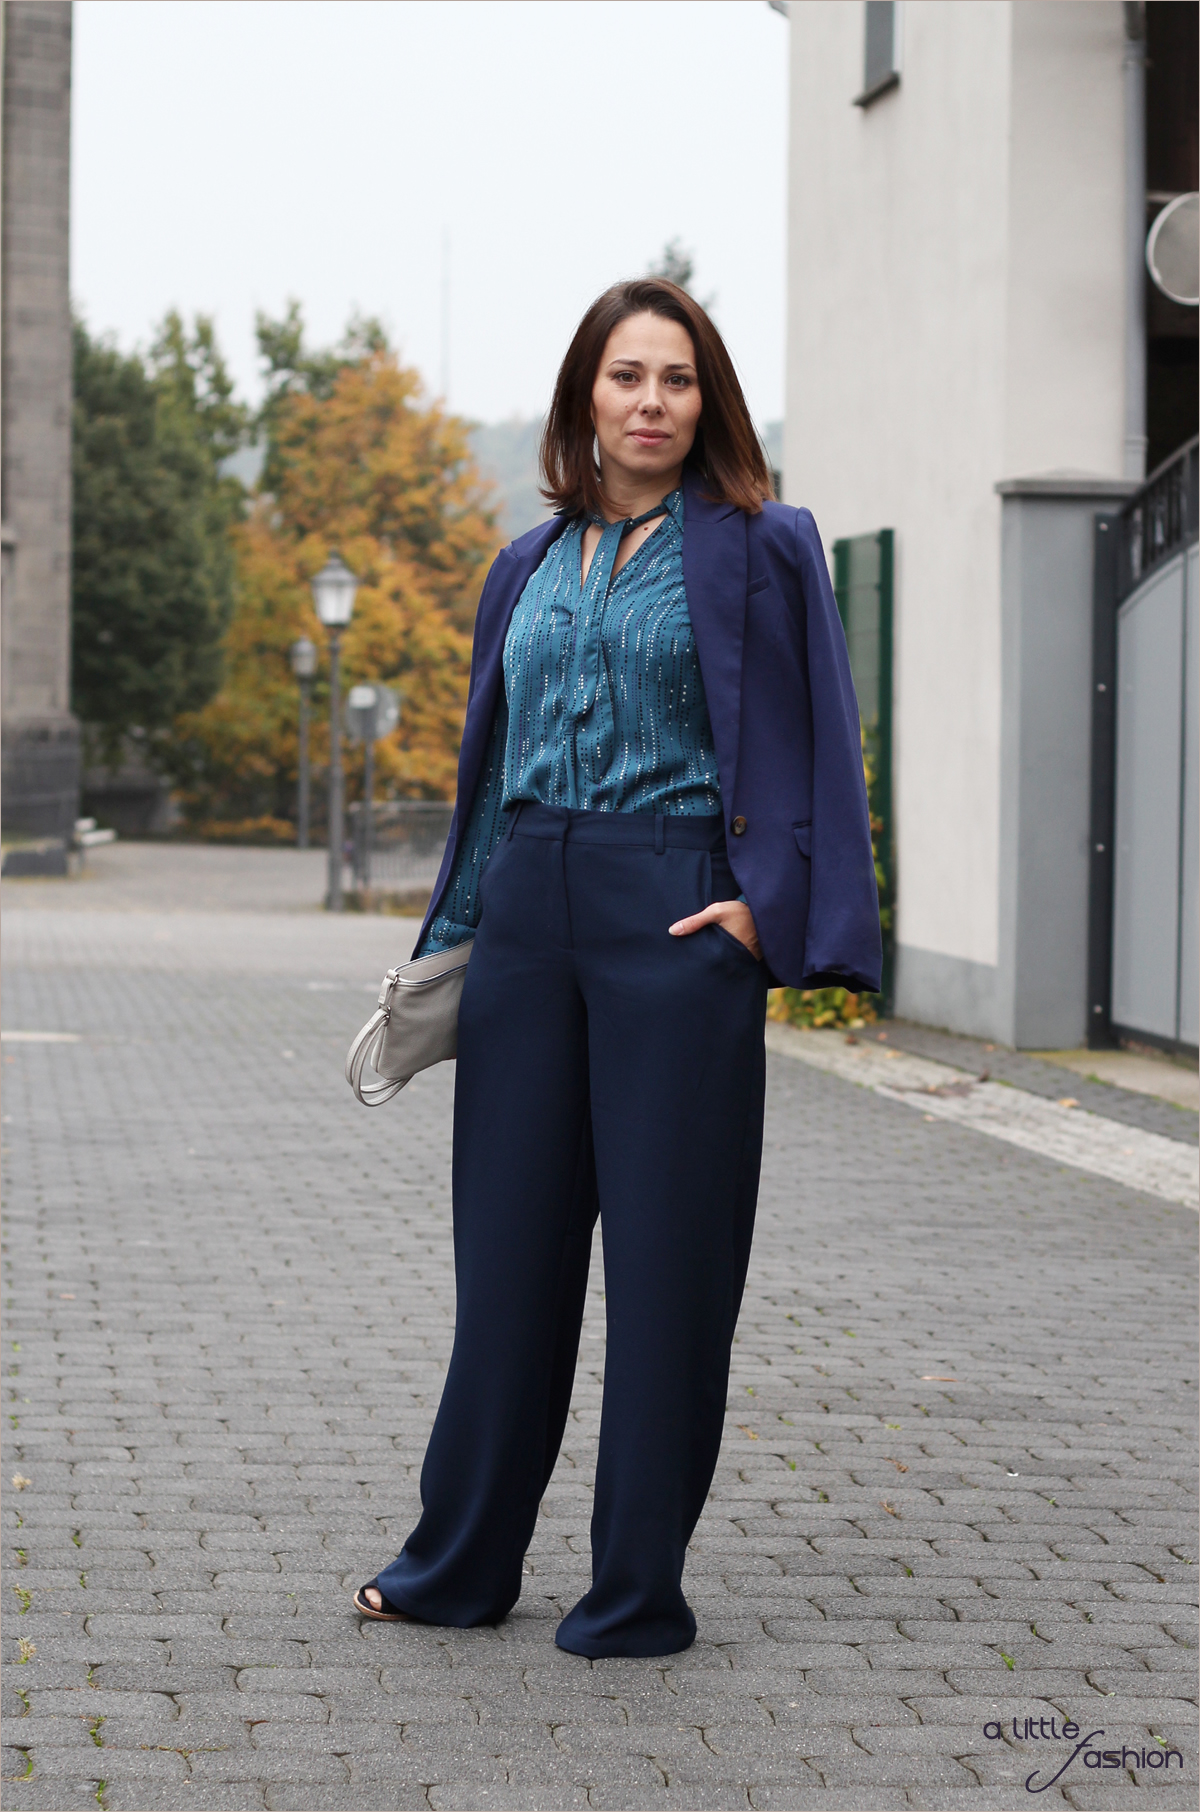 H/W2015: Schluppenblusen, weite Hosen & Blau | A Little Fashion | https://www.filizity.com/fashion/hw2015-schluppenblusen-weite-hosen-blau